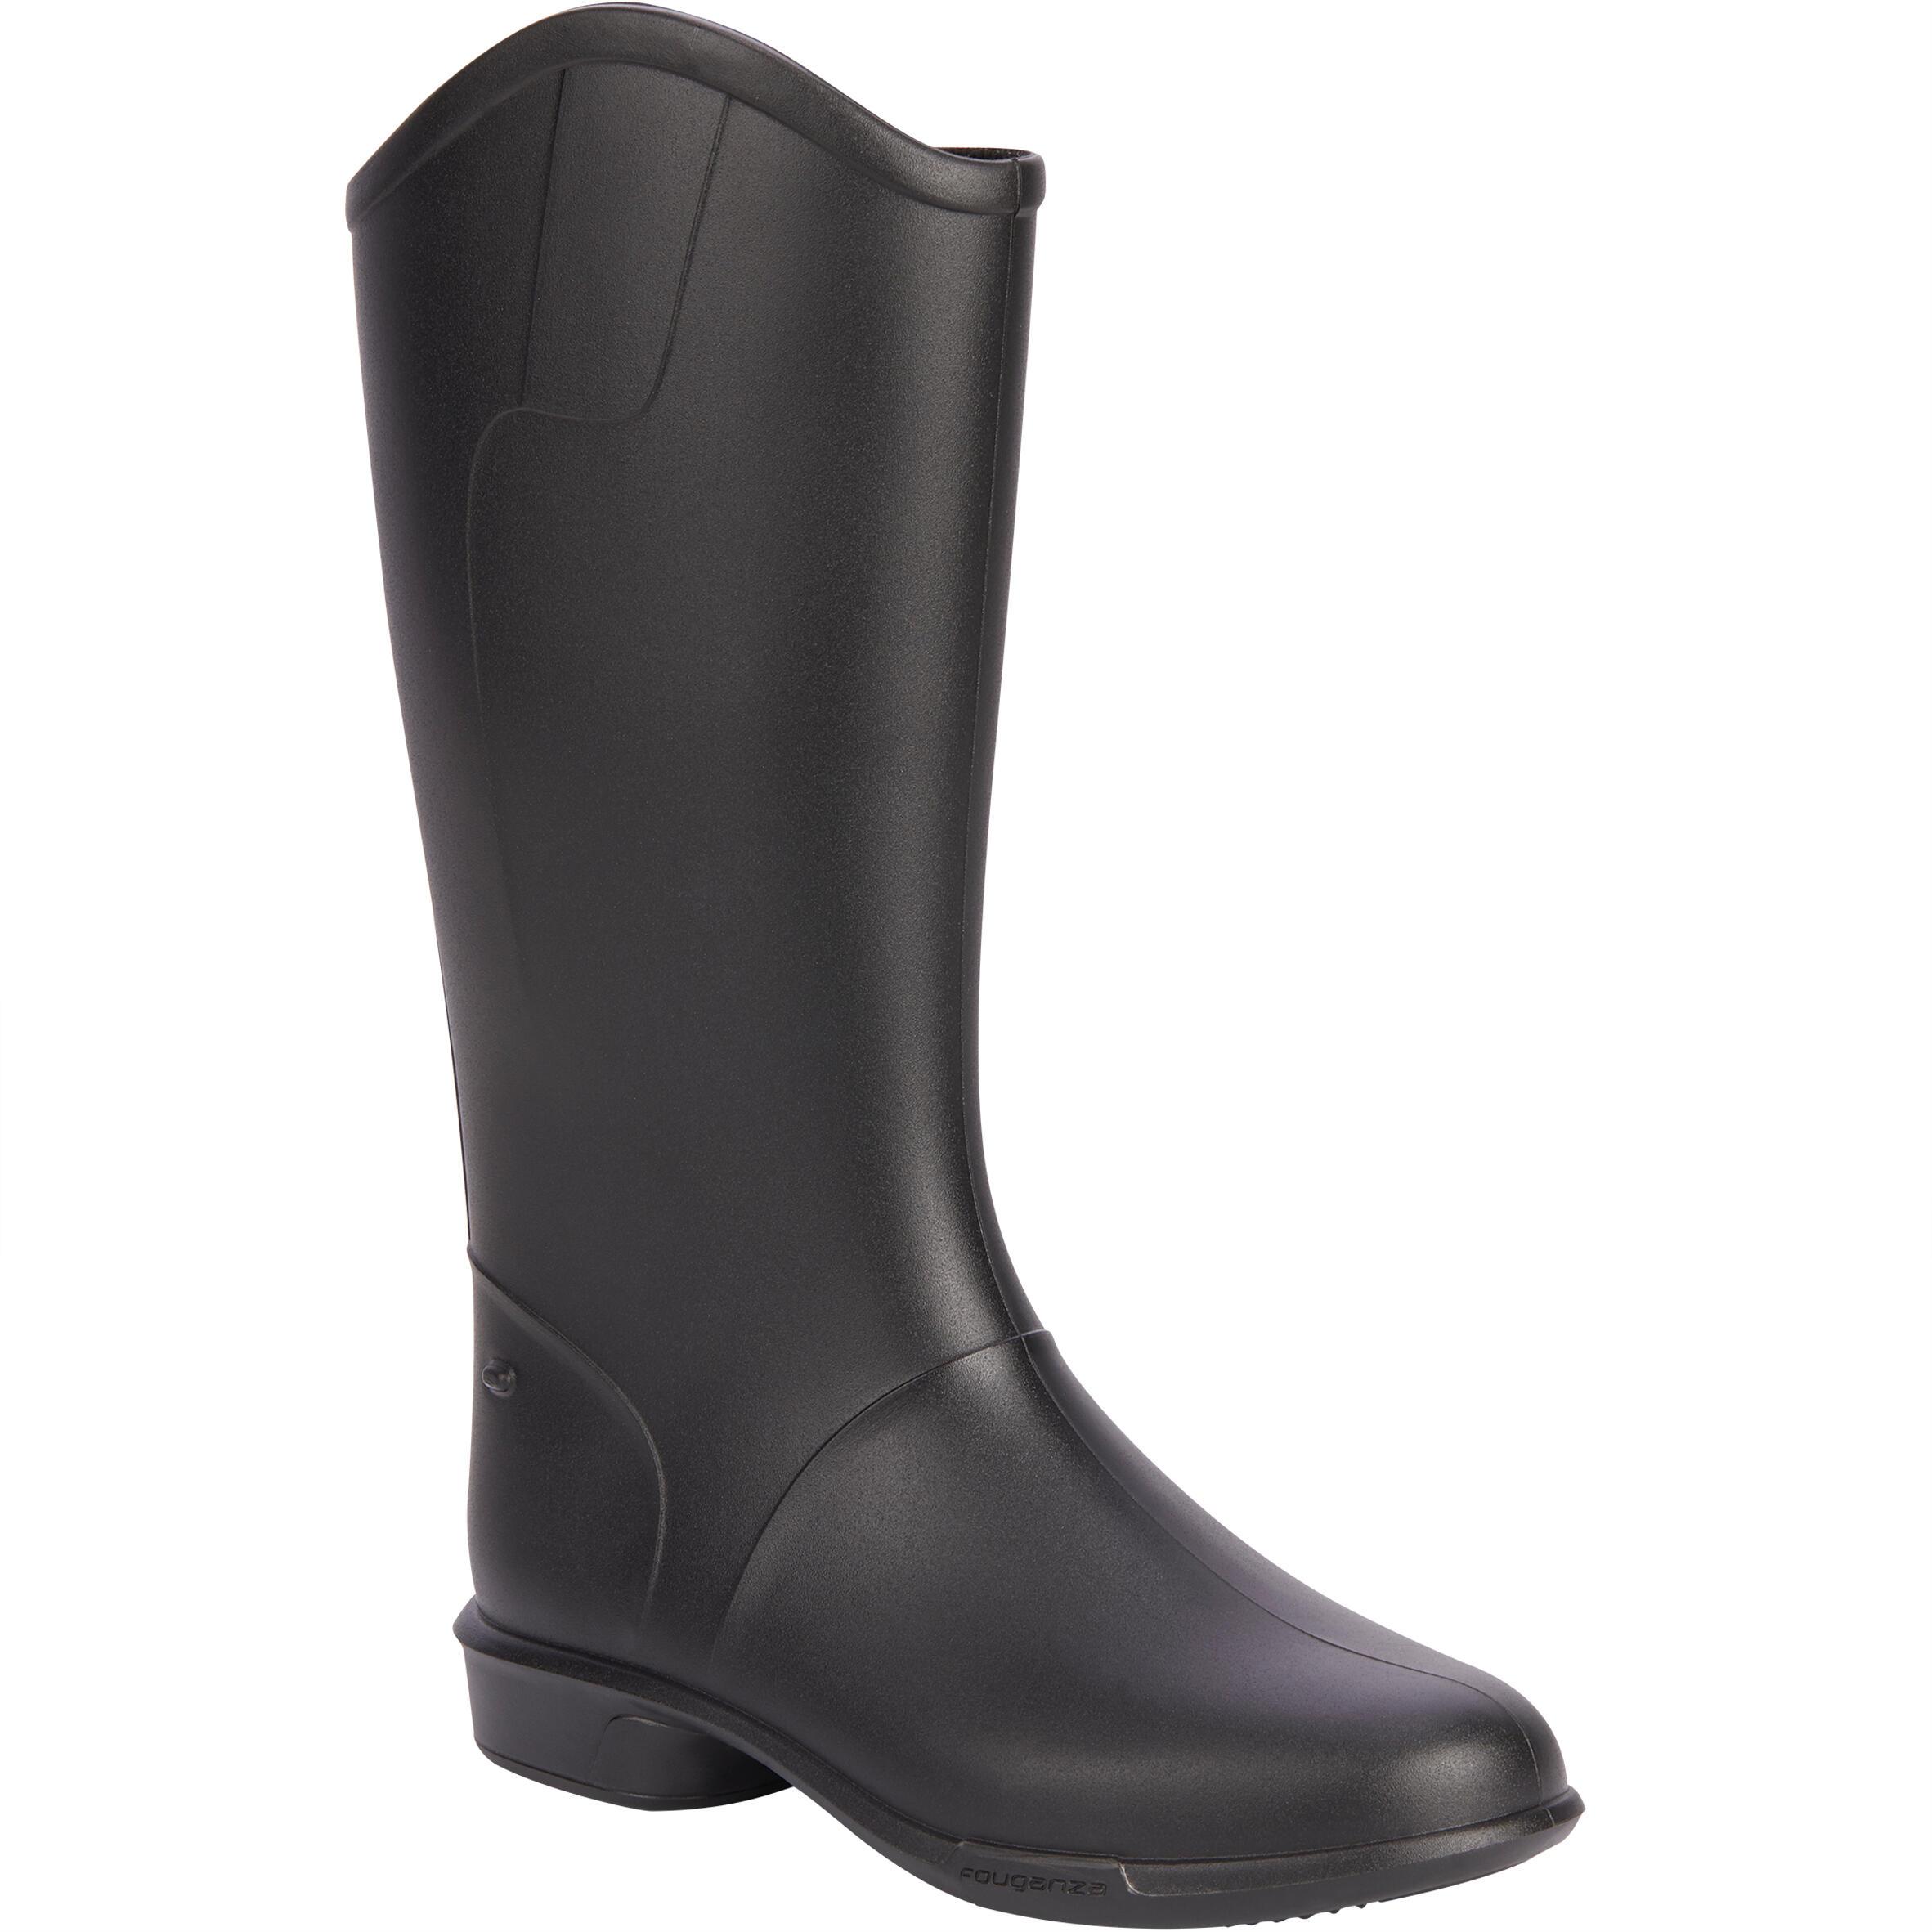 BH 100 Kids' Horse Riding Boots - Black